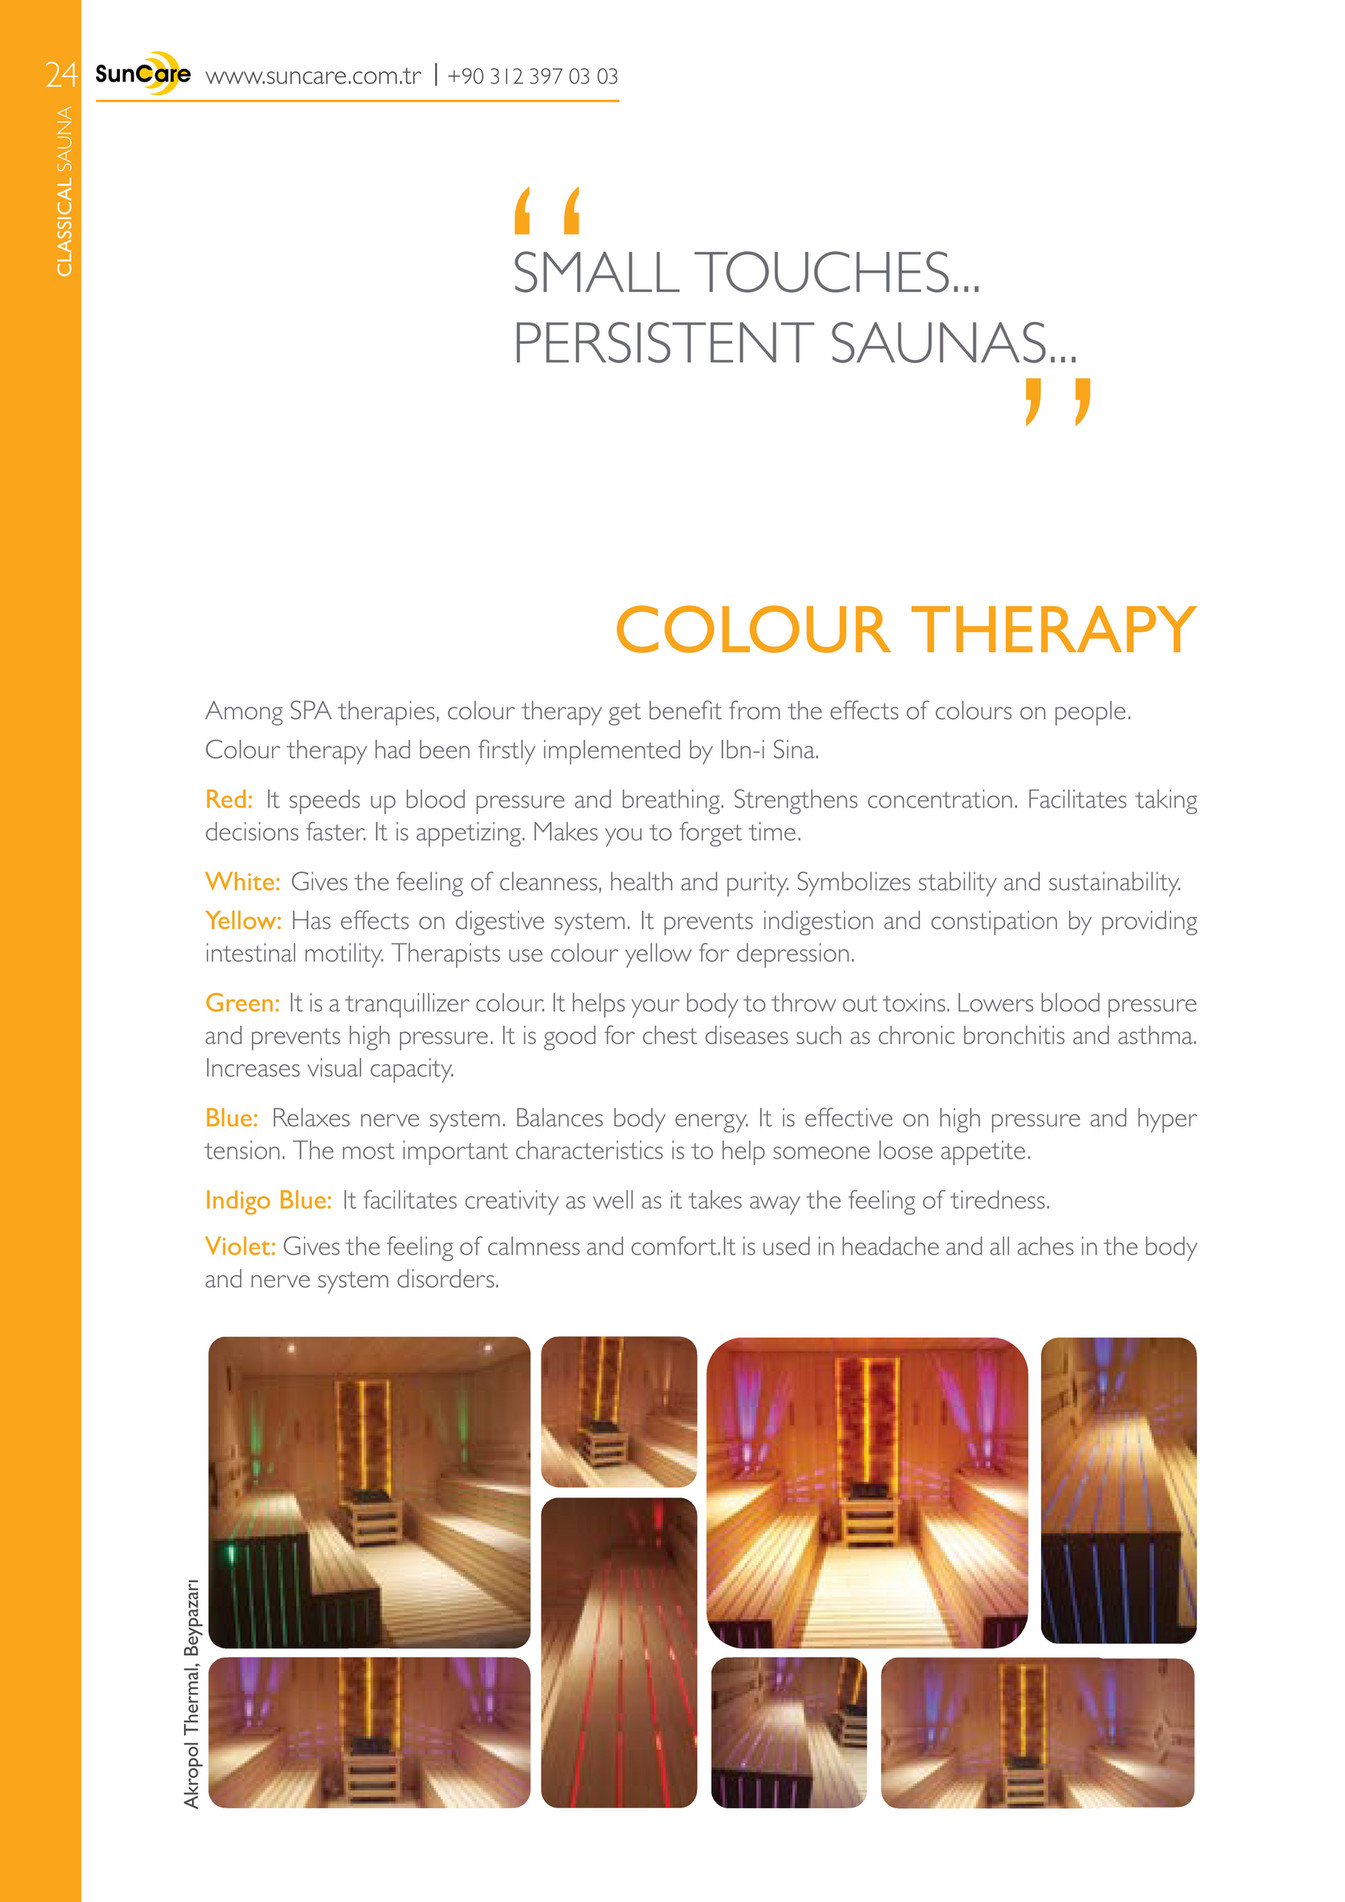 Colour therapy for high bp - Colour therapy for high blood pressure